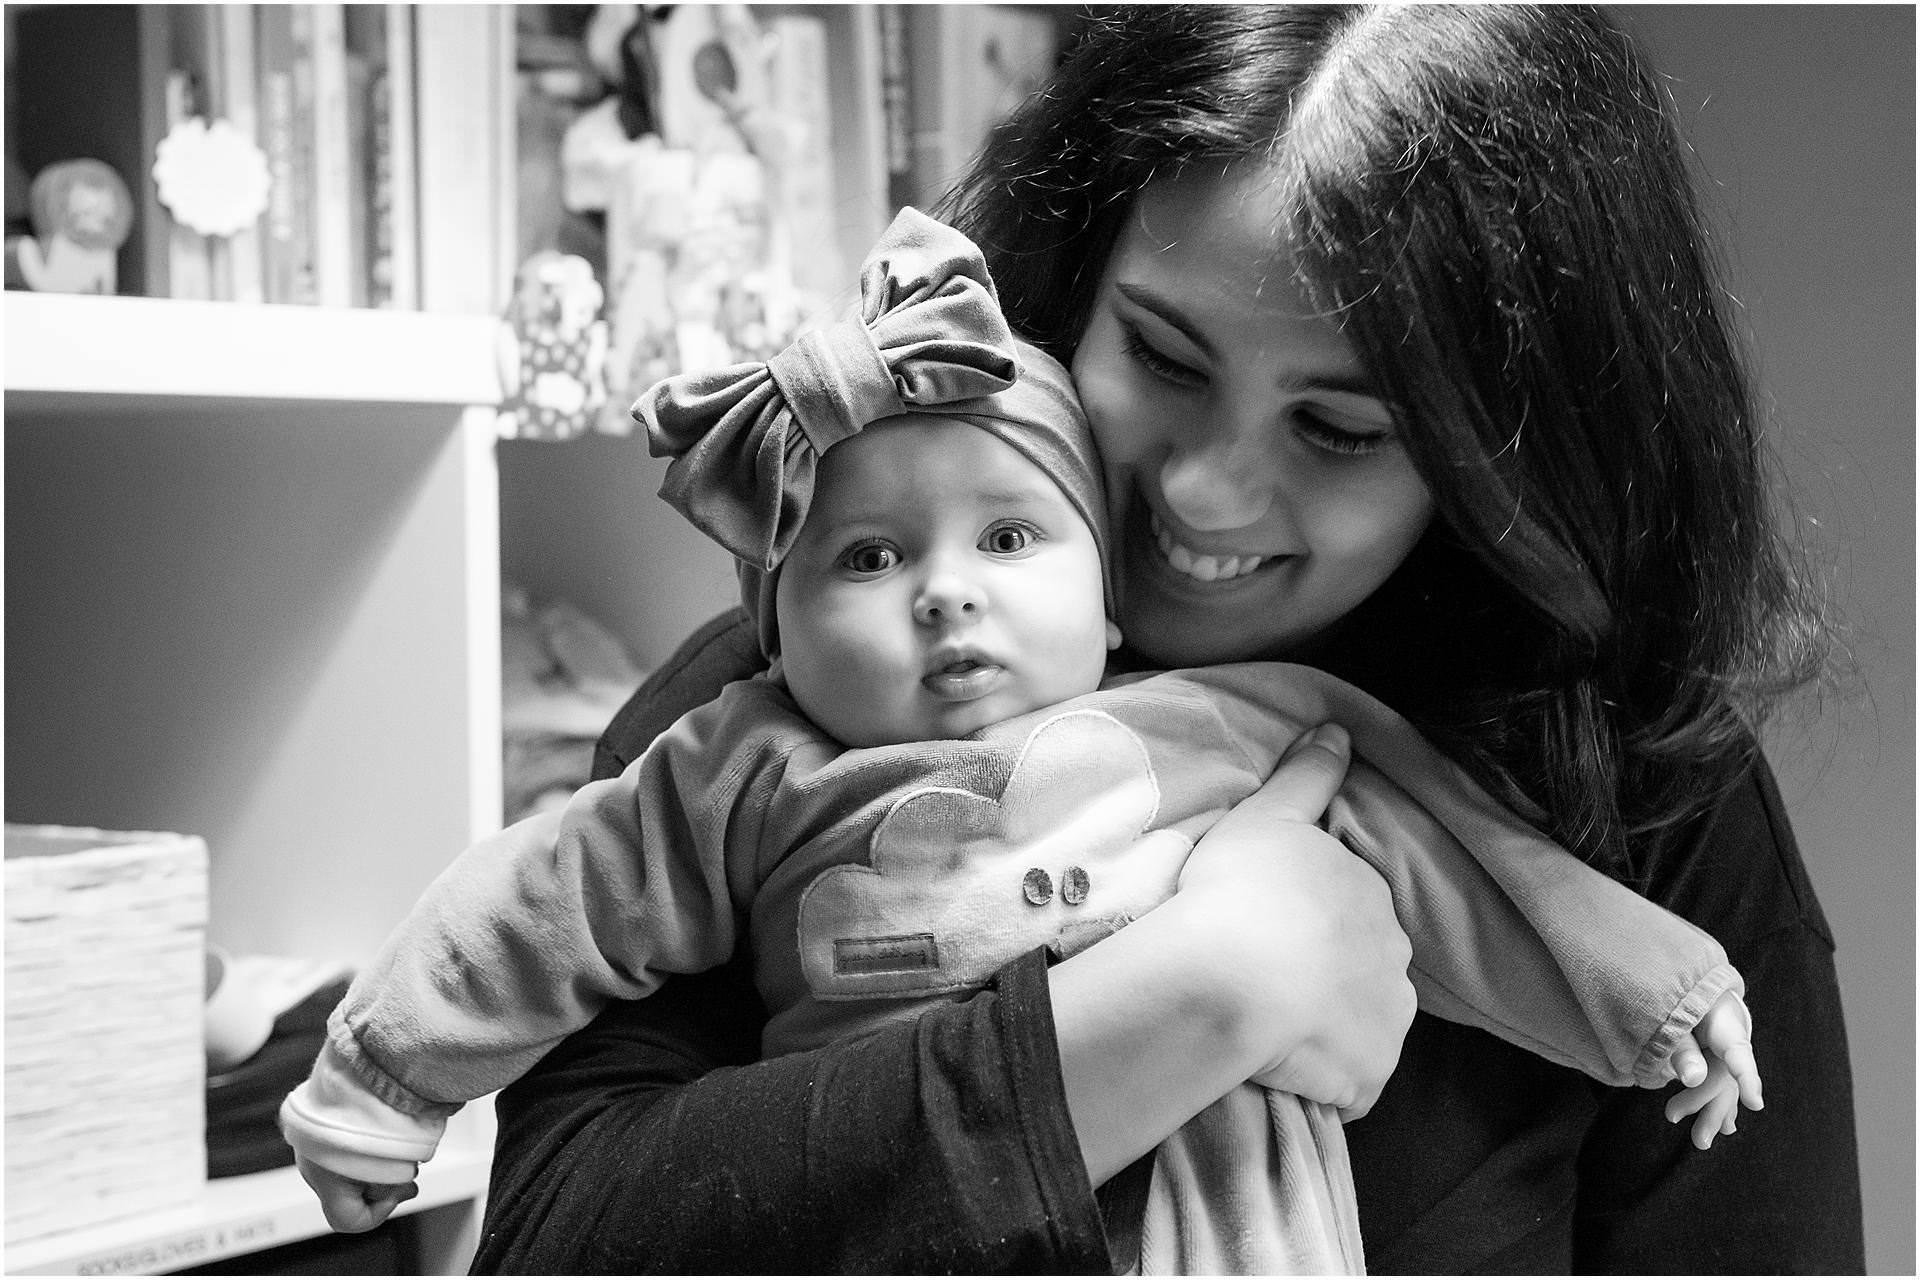 Newborn_photography with Sarah_bee_photography lifestyle_photography family_photography natural_photography photography_in_your_own_home baby_and_child_photography_1942.jpg